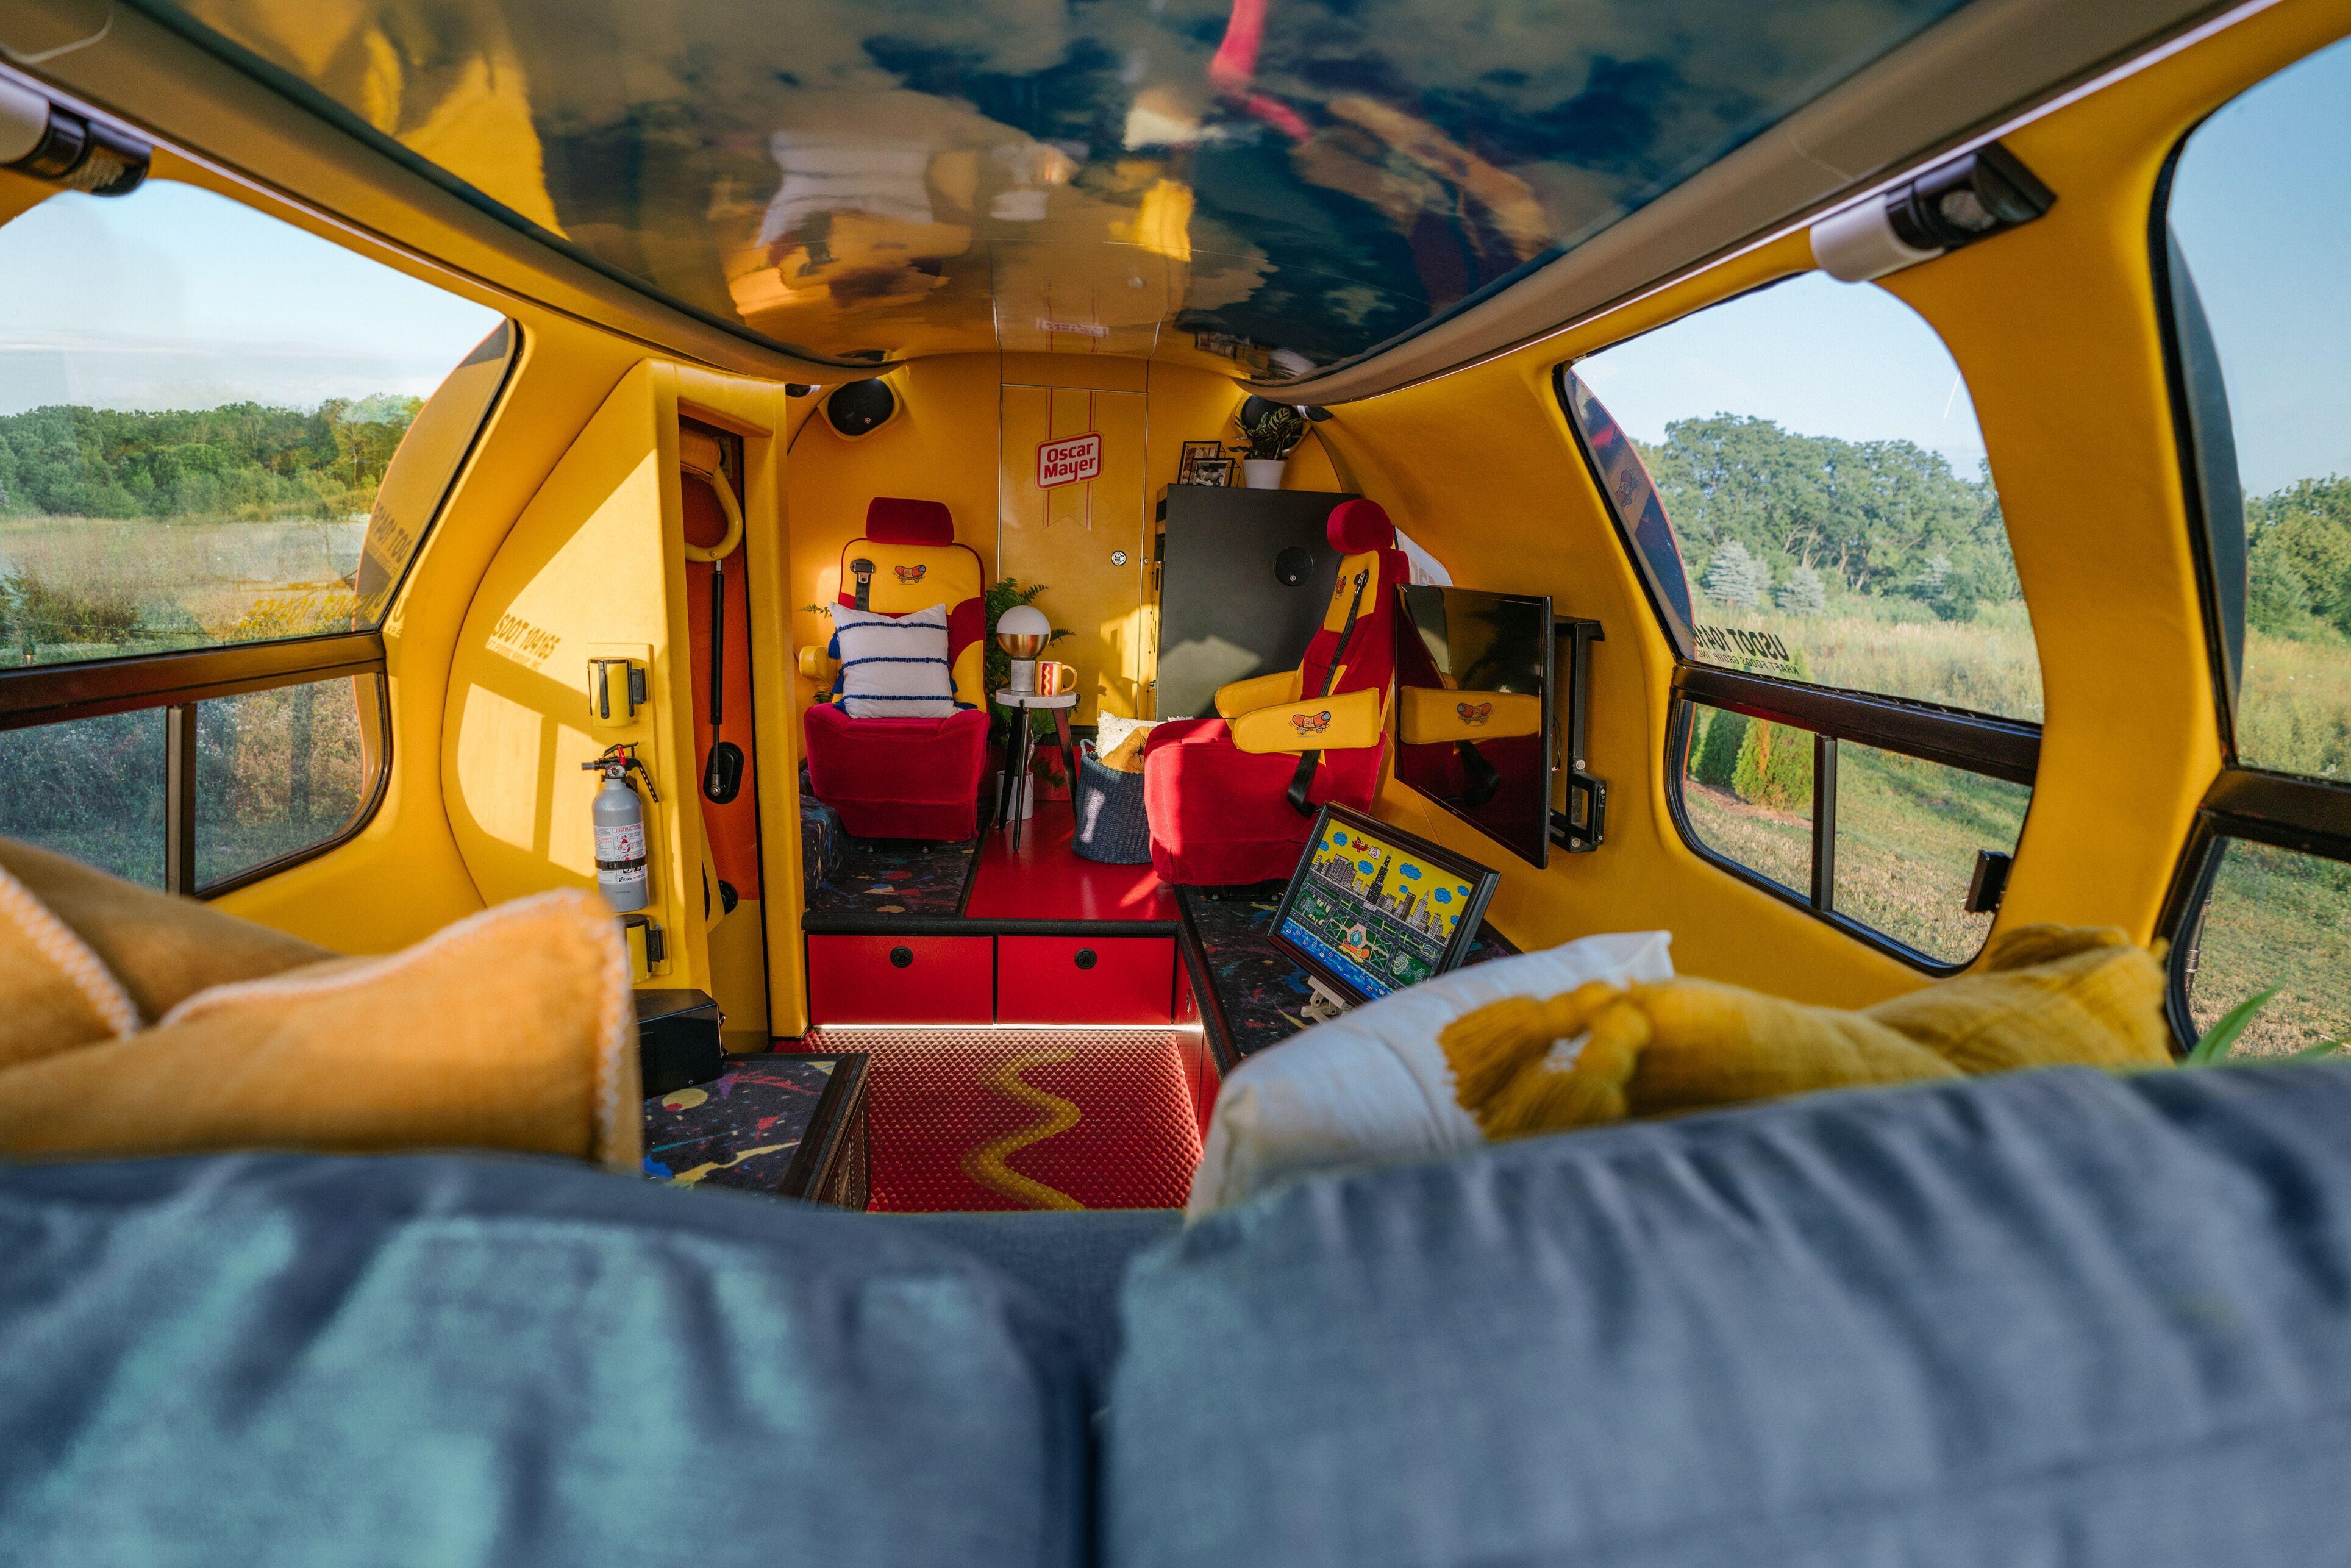 Inside of Oscar Meyer Weinermobile on Airbnb